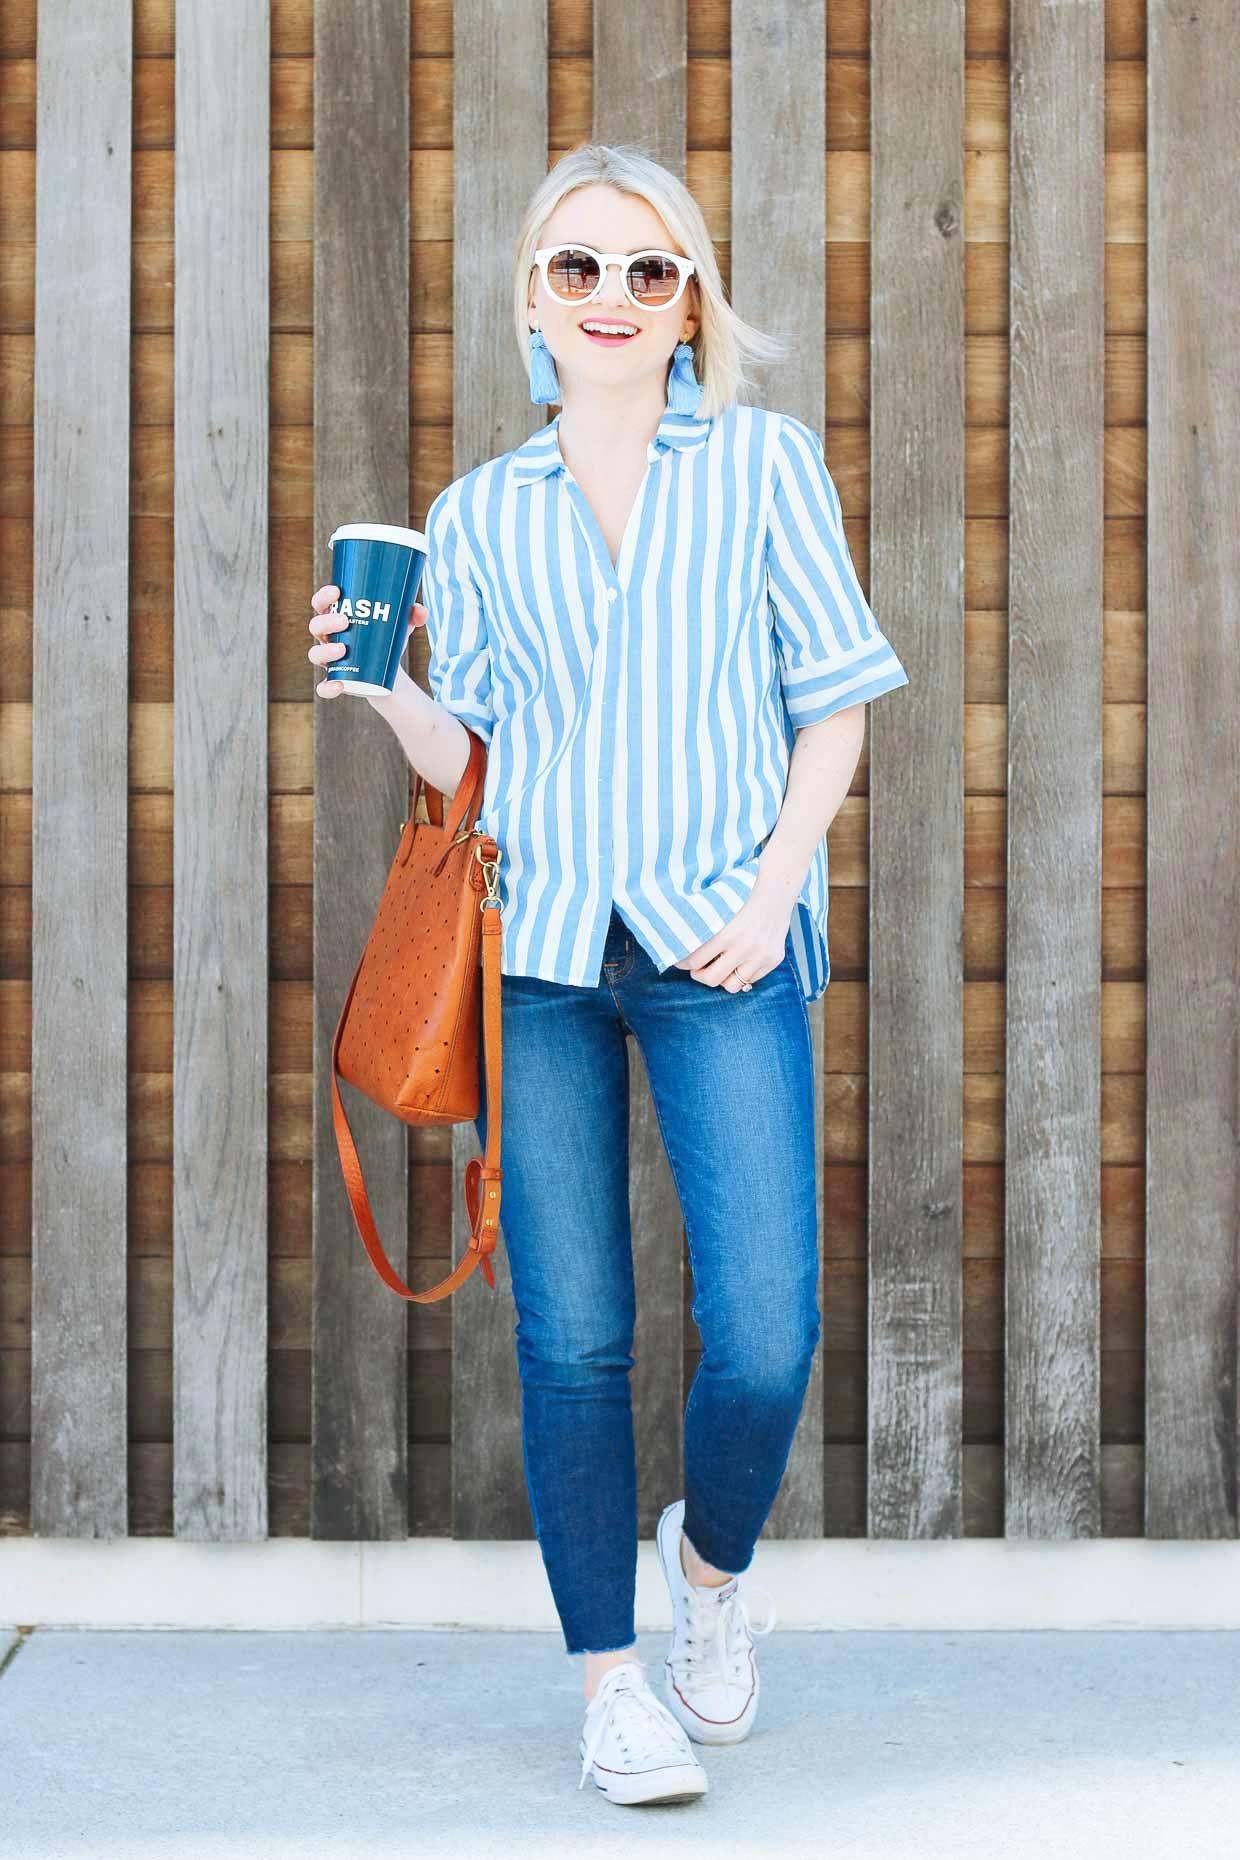 J Crew Blue Stripe Short Sleeve Button Up Shirt Fashion